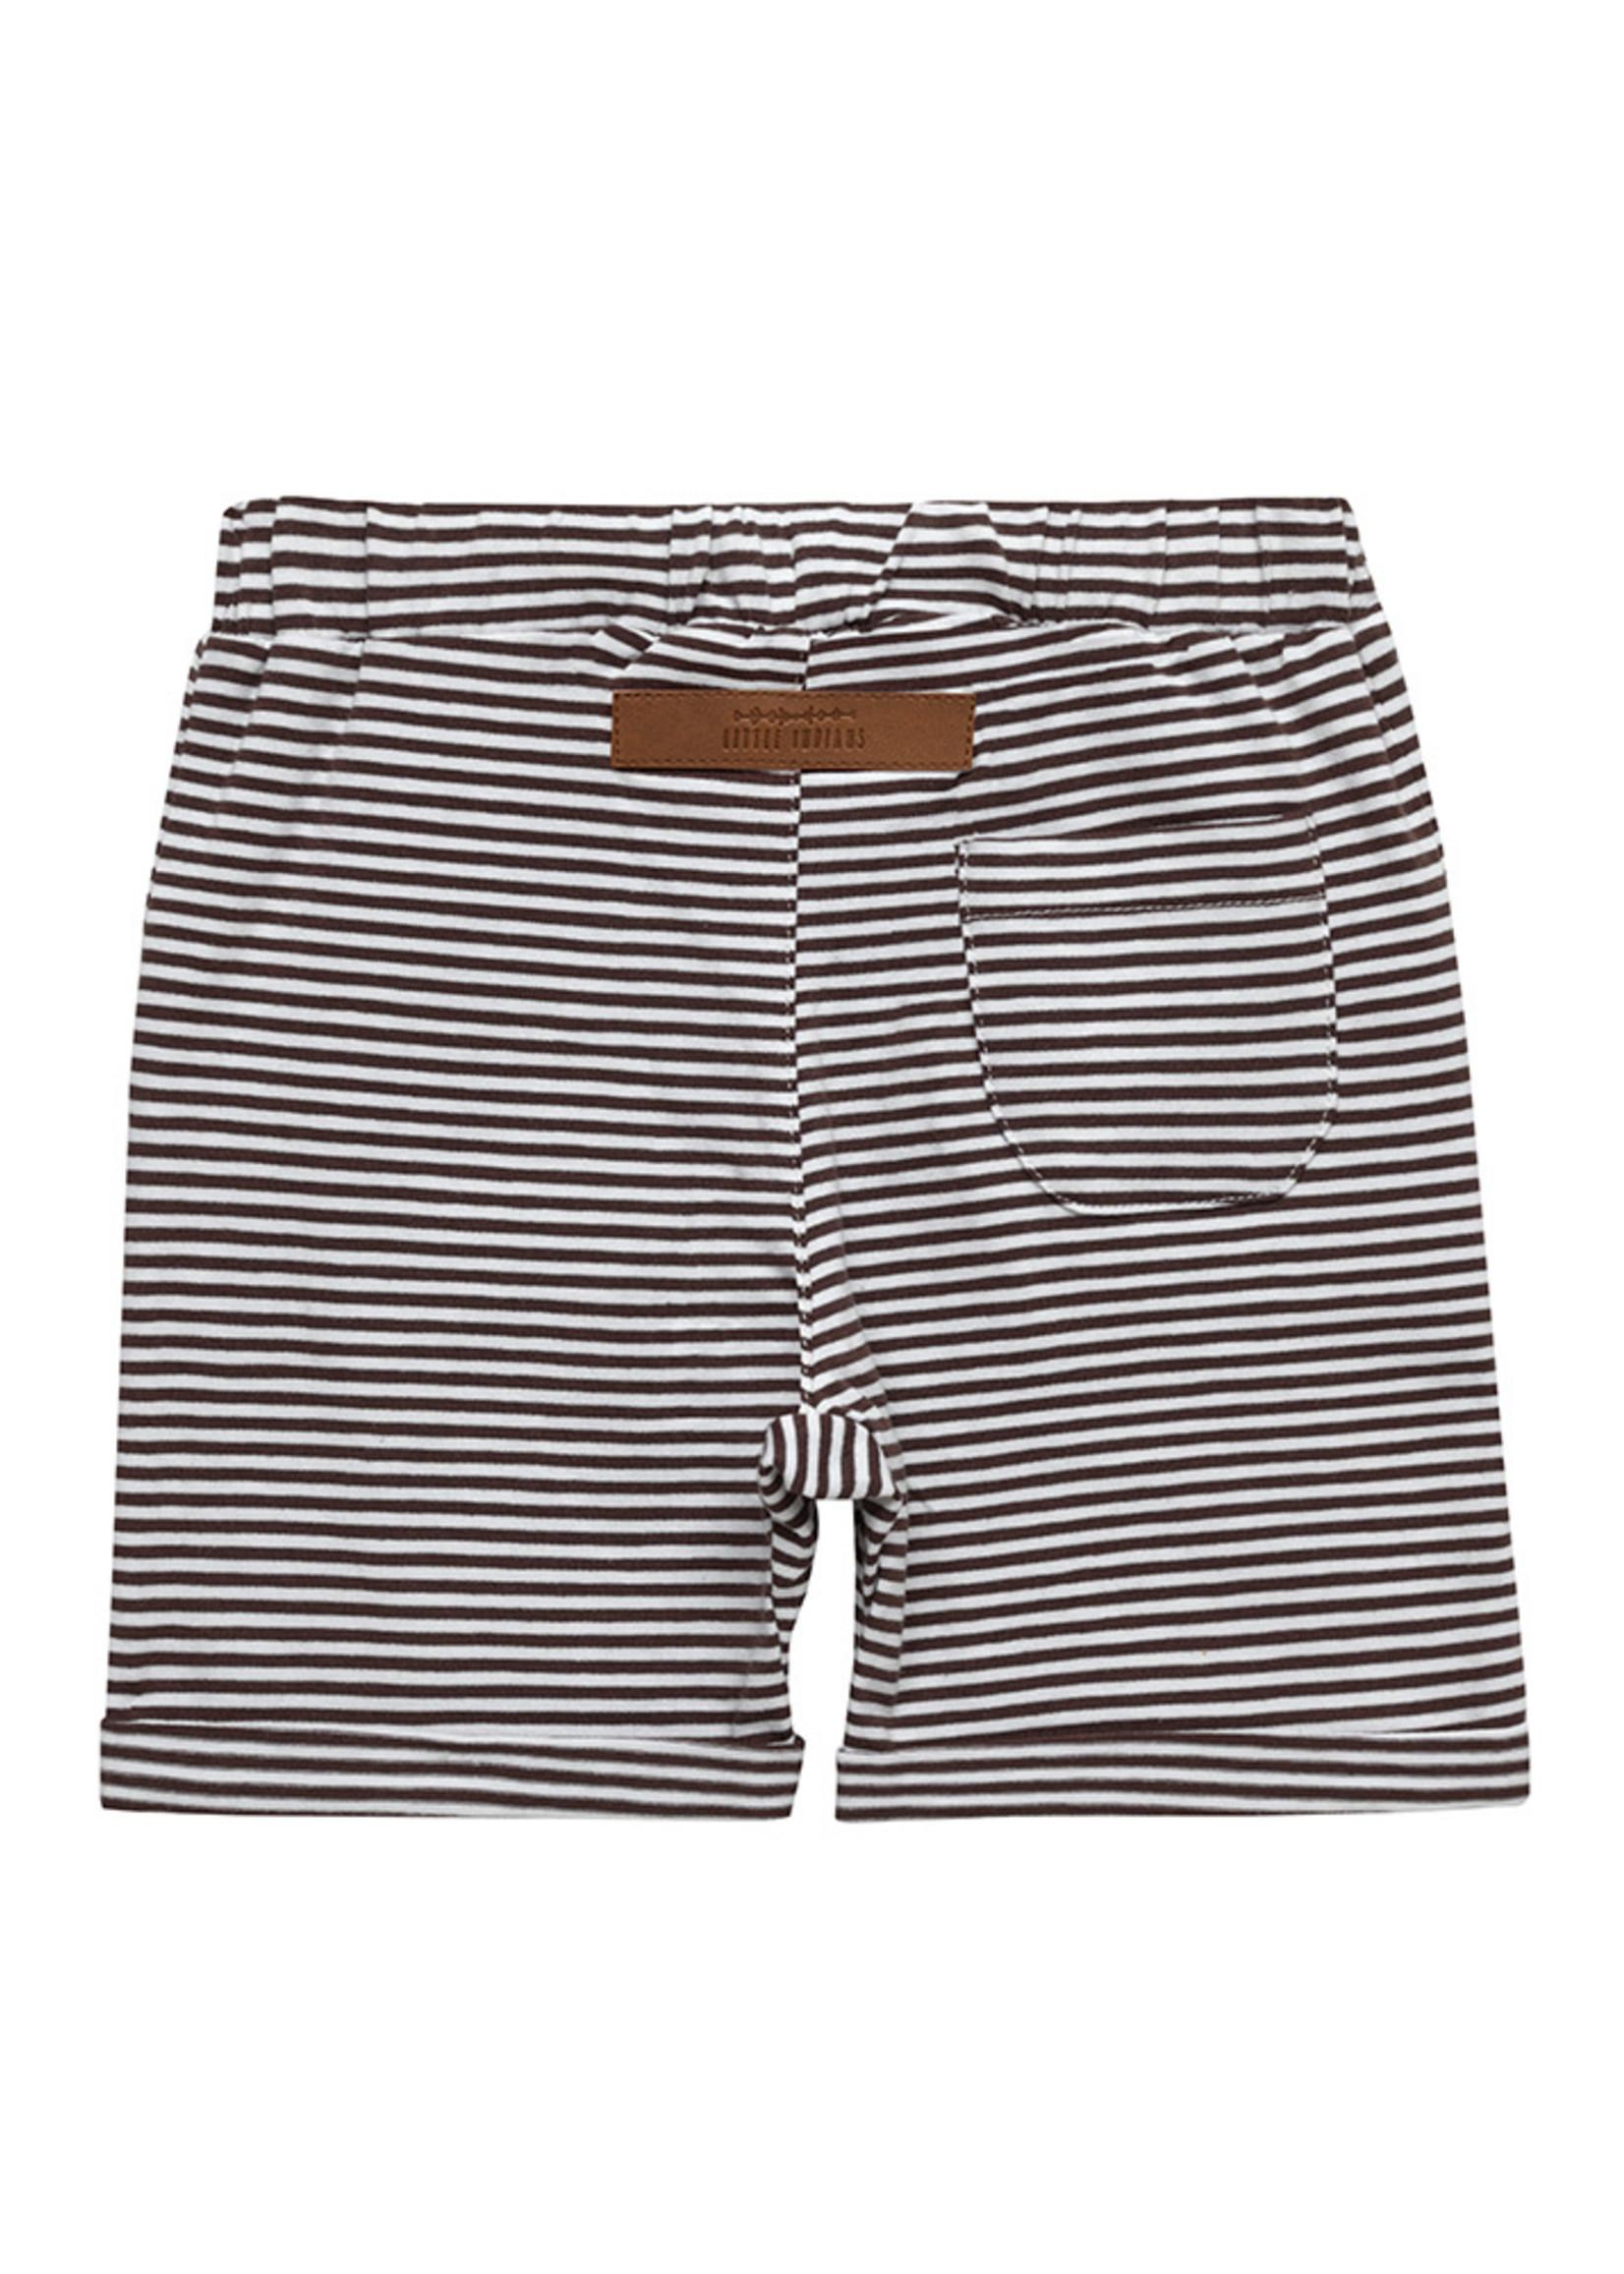 Little Indians LI - Short Brown Stripe